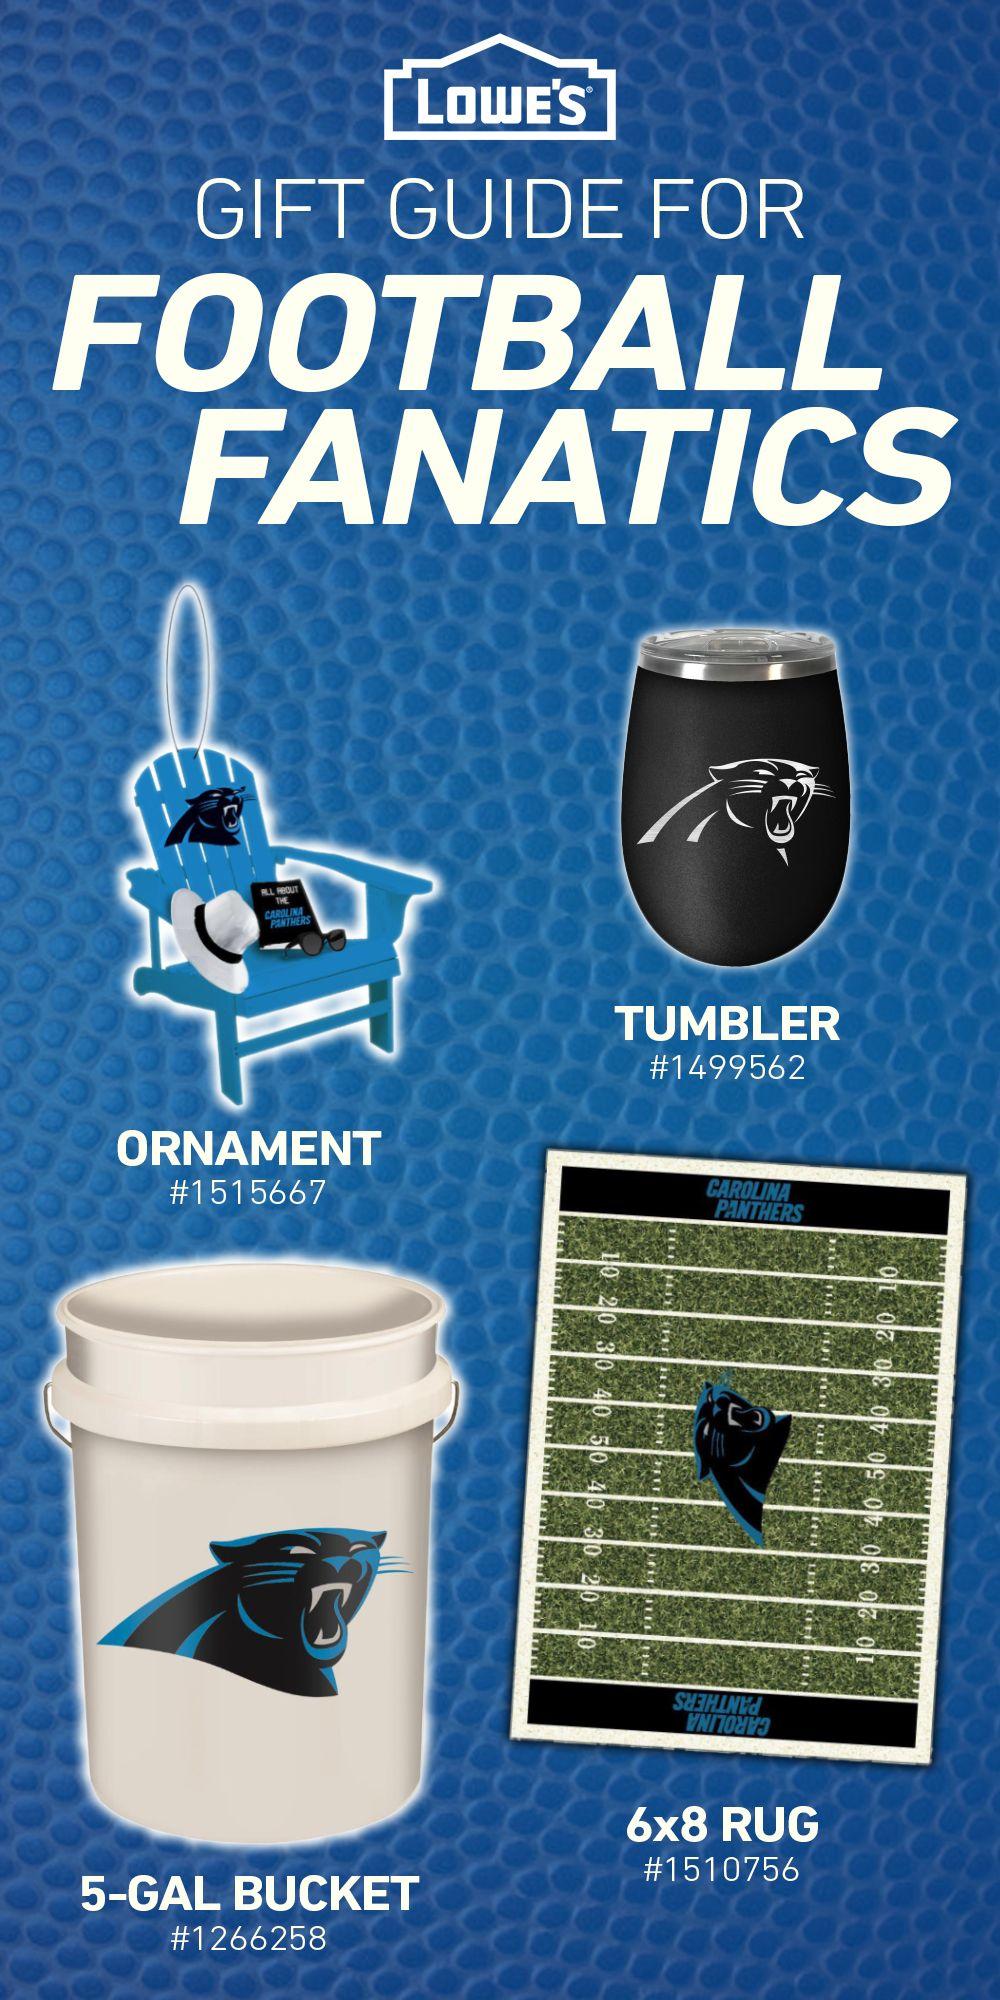 Gift Guide: Football Fanatics